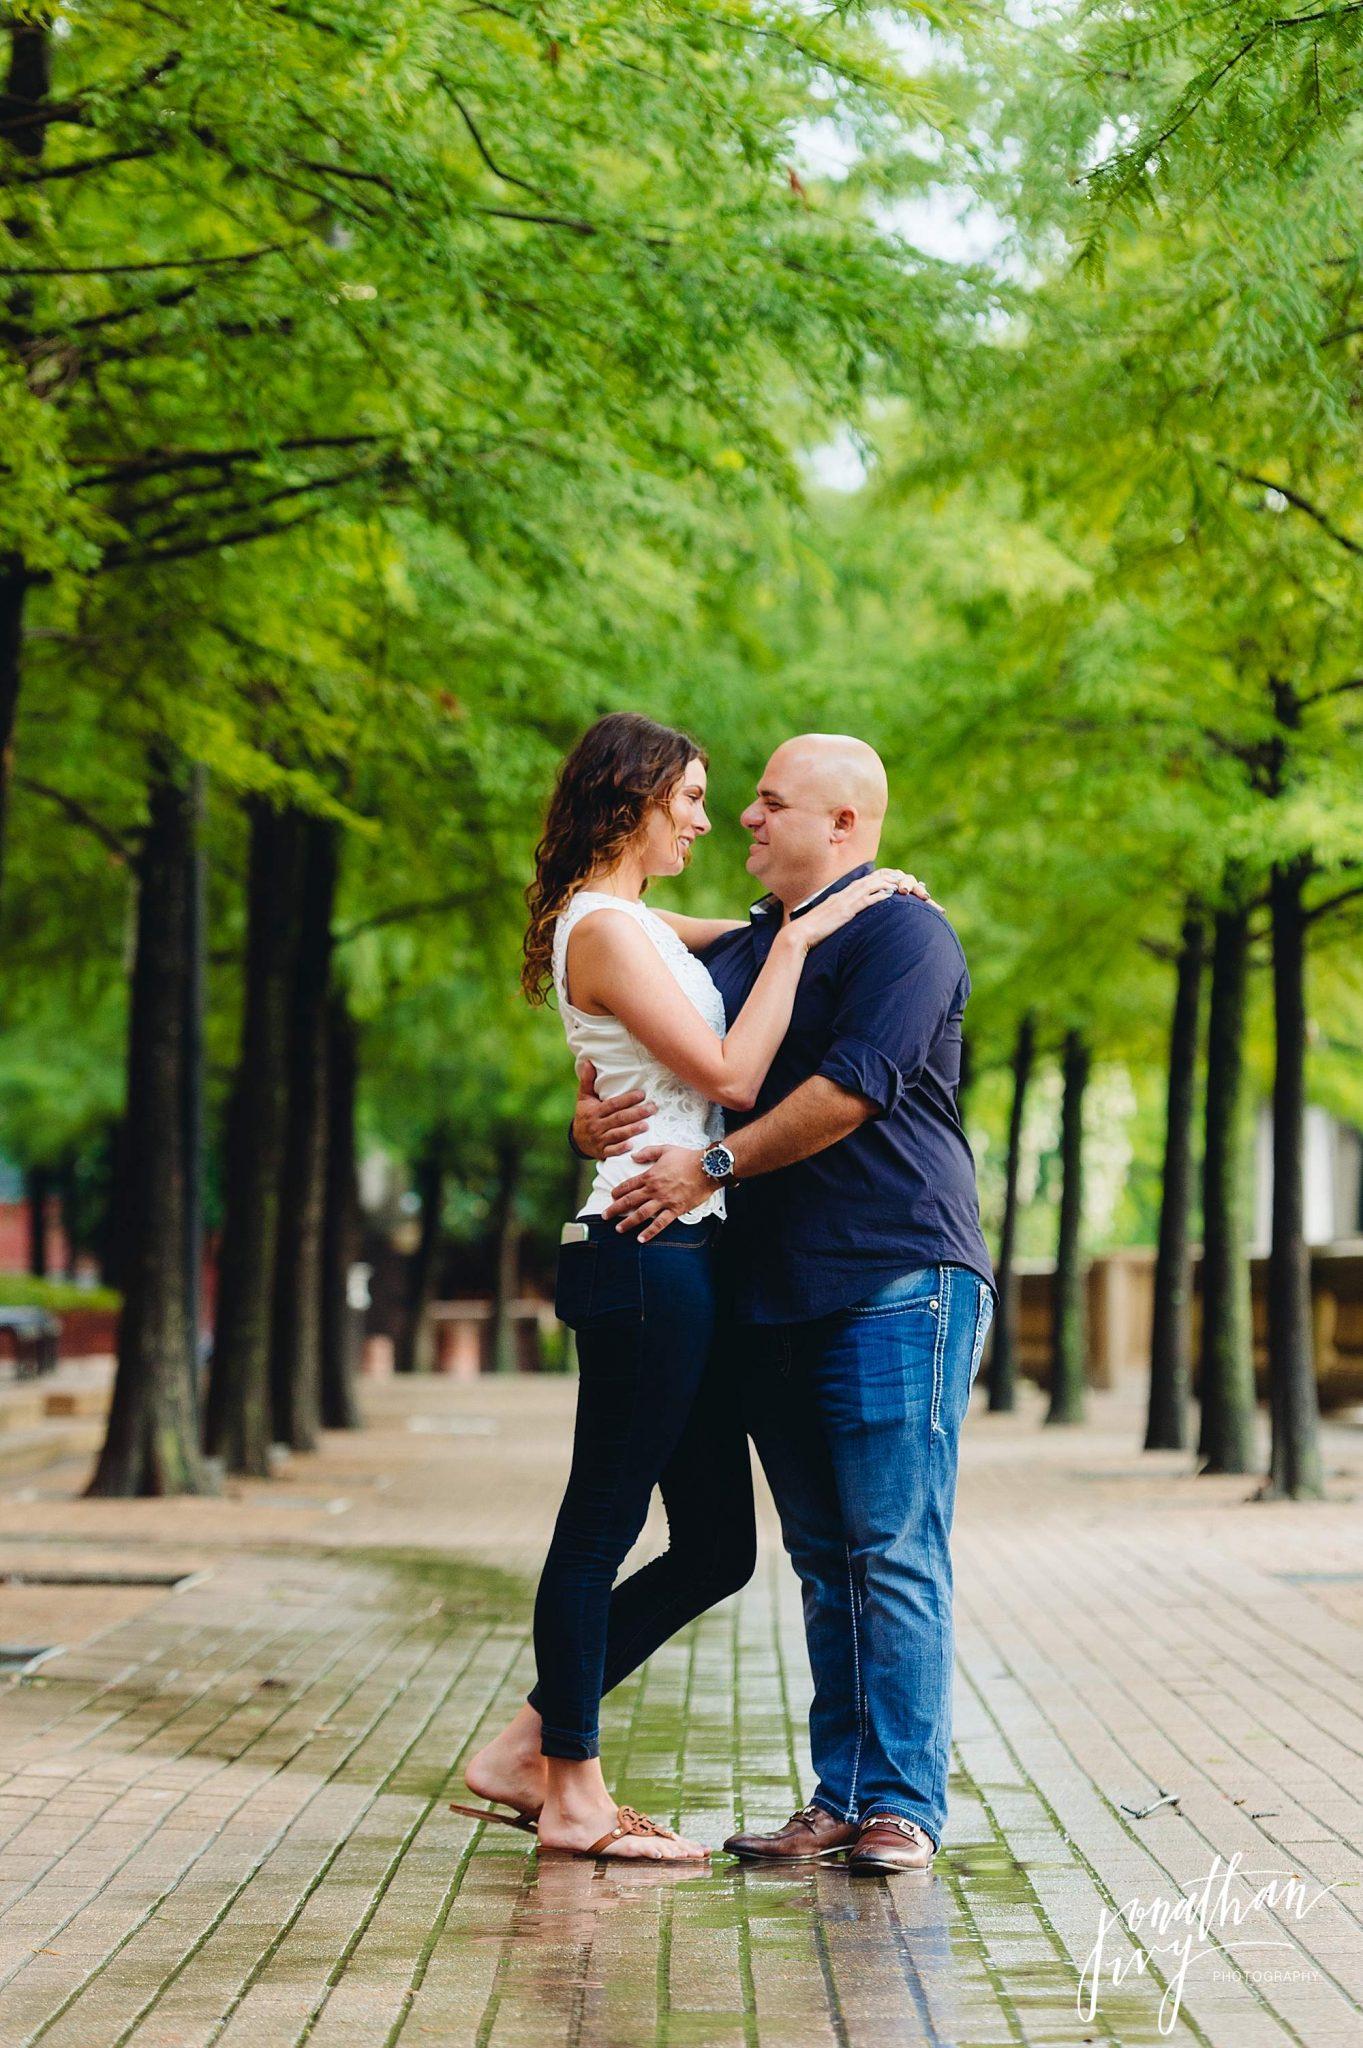 Romantic-Engagement-Photos-Houston_0011.jpg